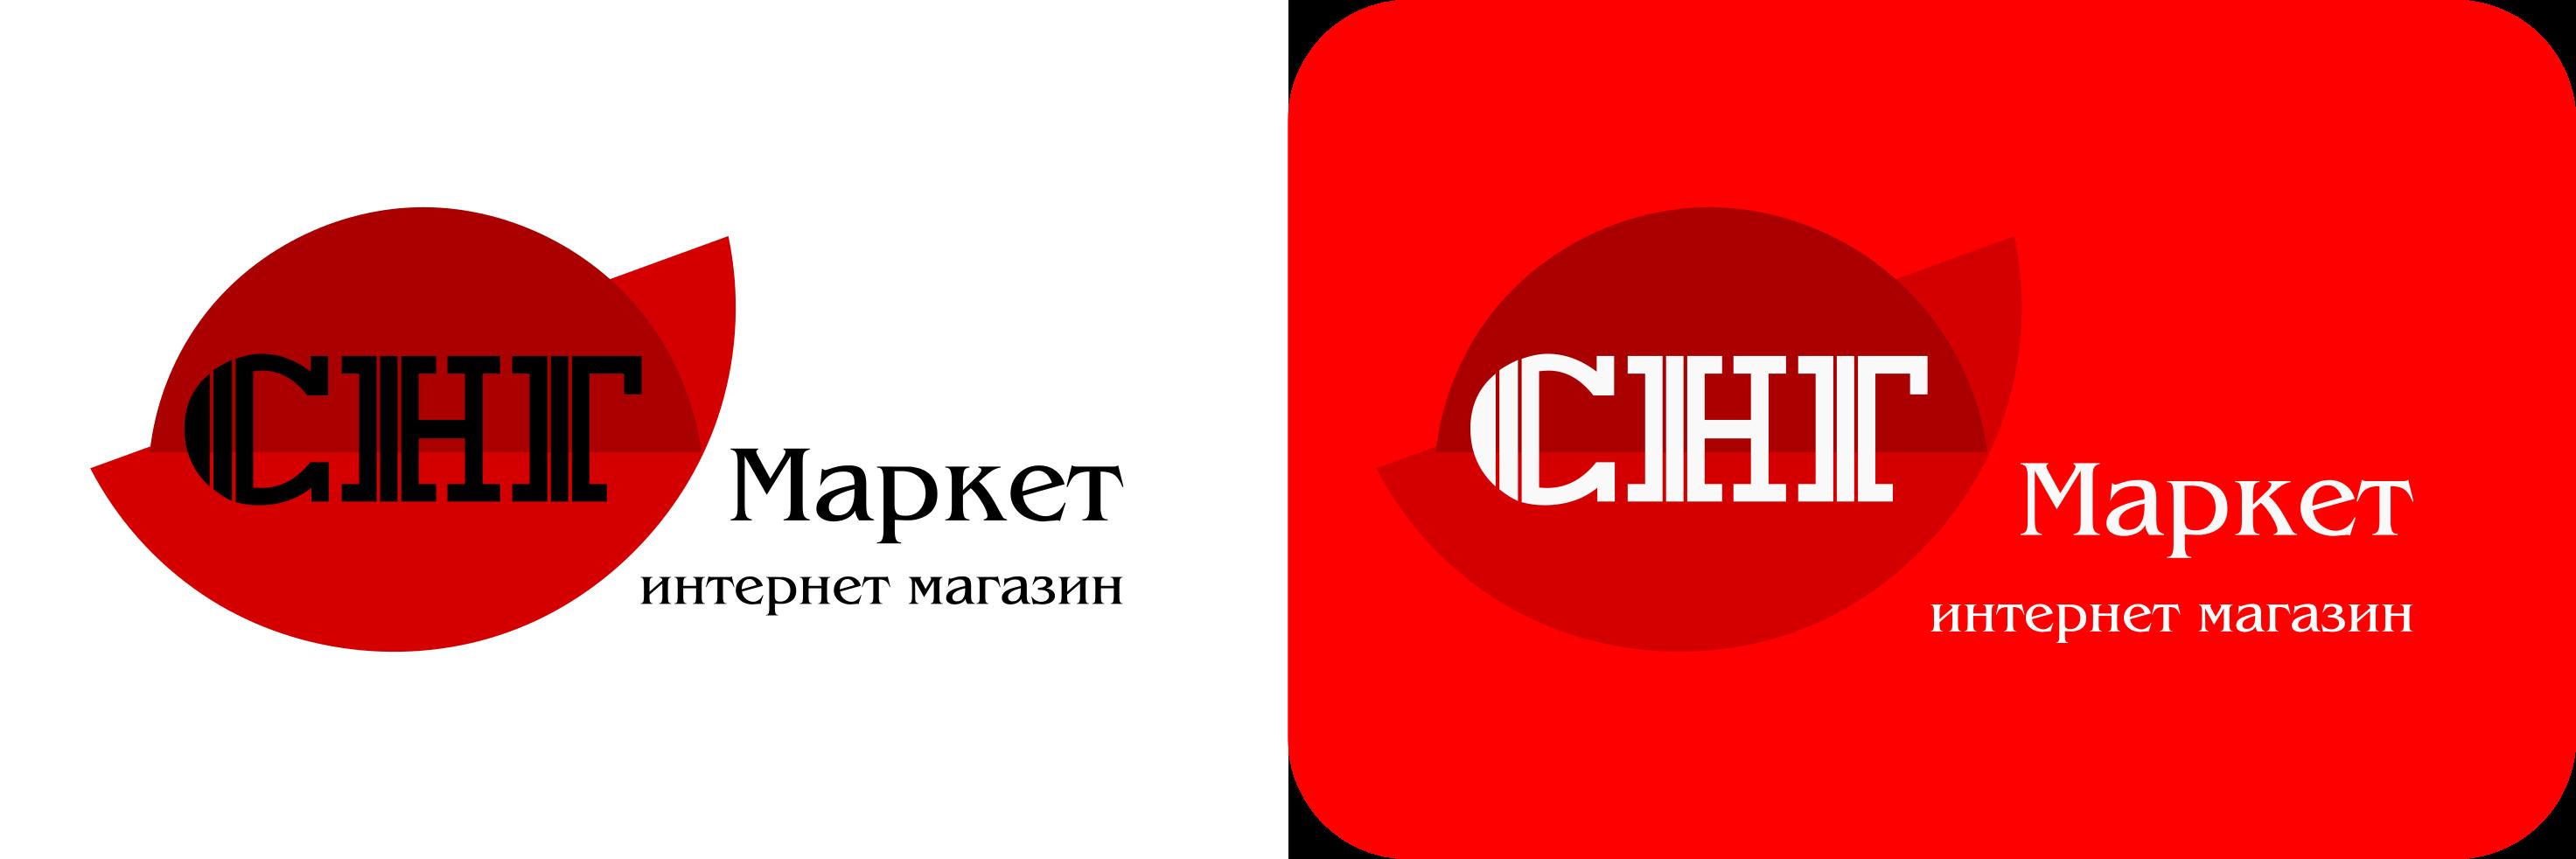 Объявляется конкурс на создание логотипа ИМ обуви фото f_4575a10016f328cd.png